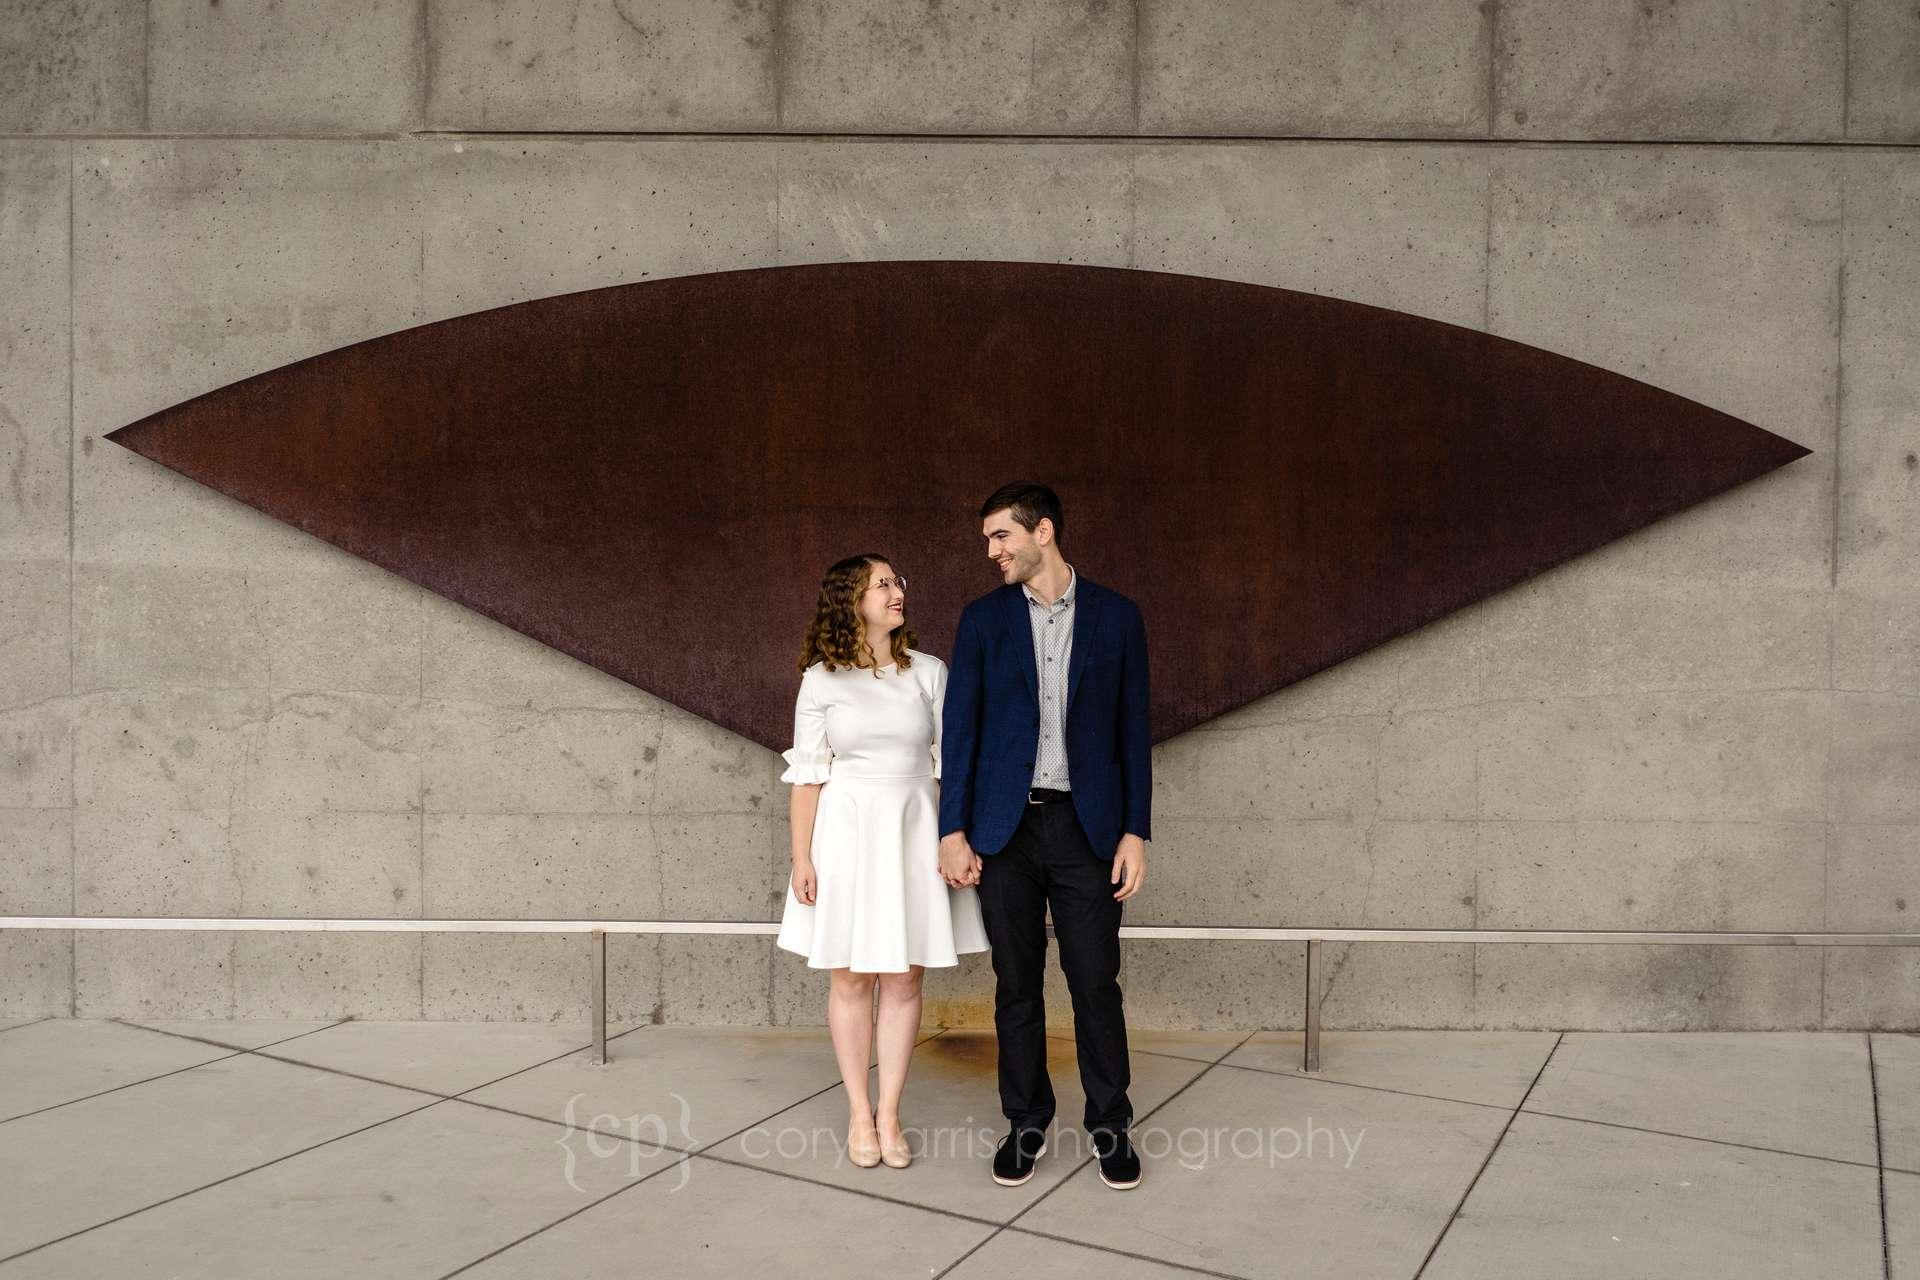 002-Seattle-engagement-portraits.jpg